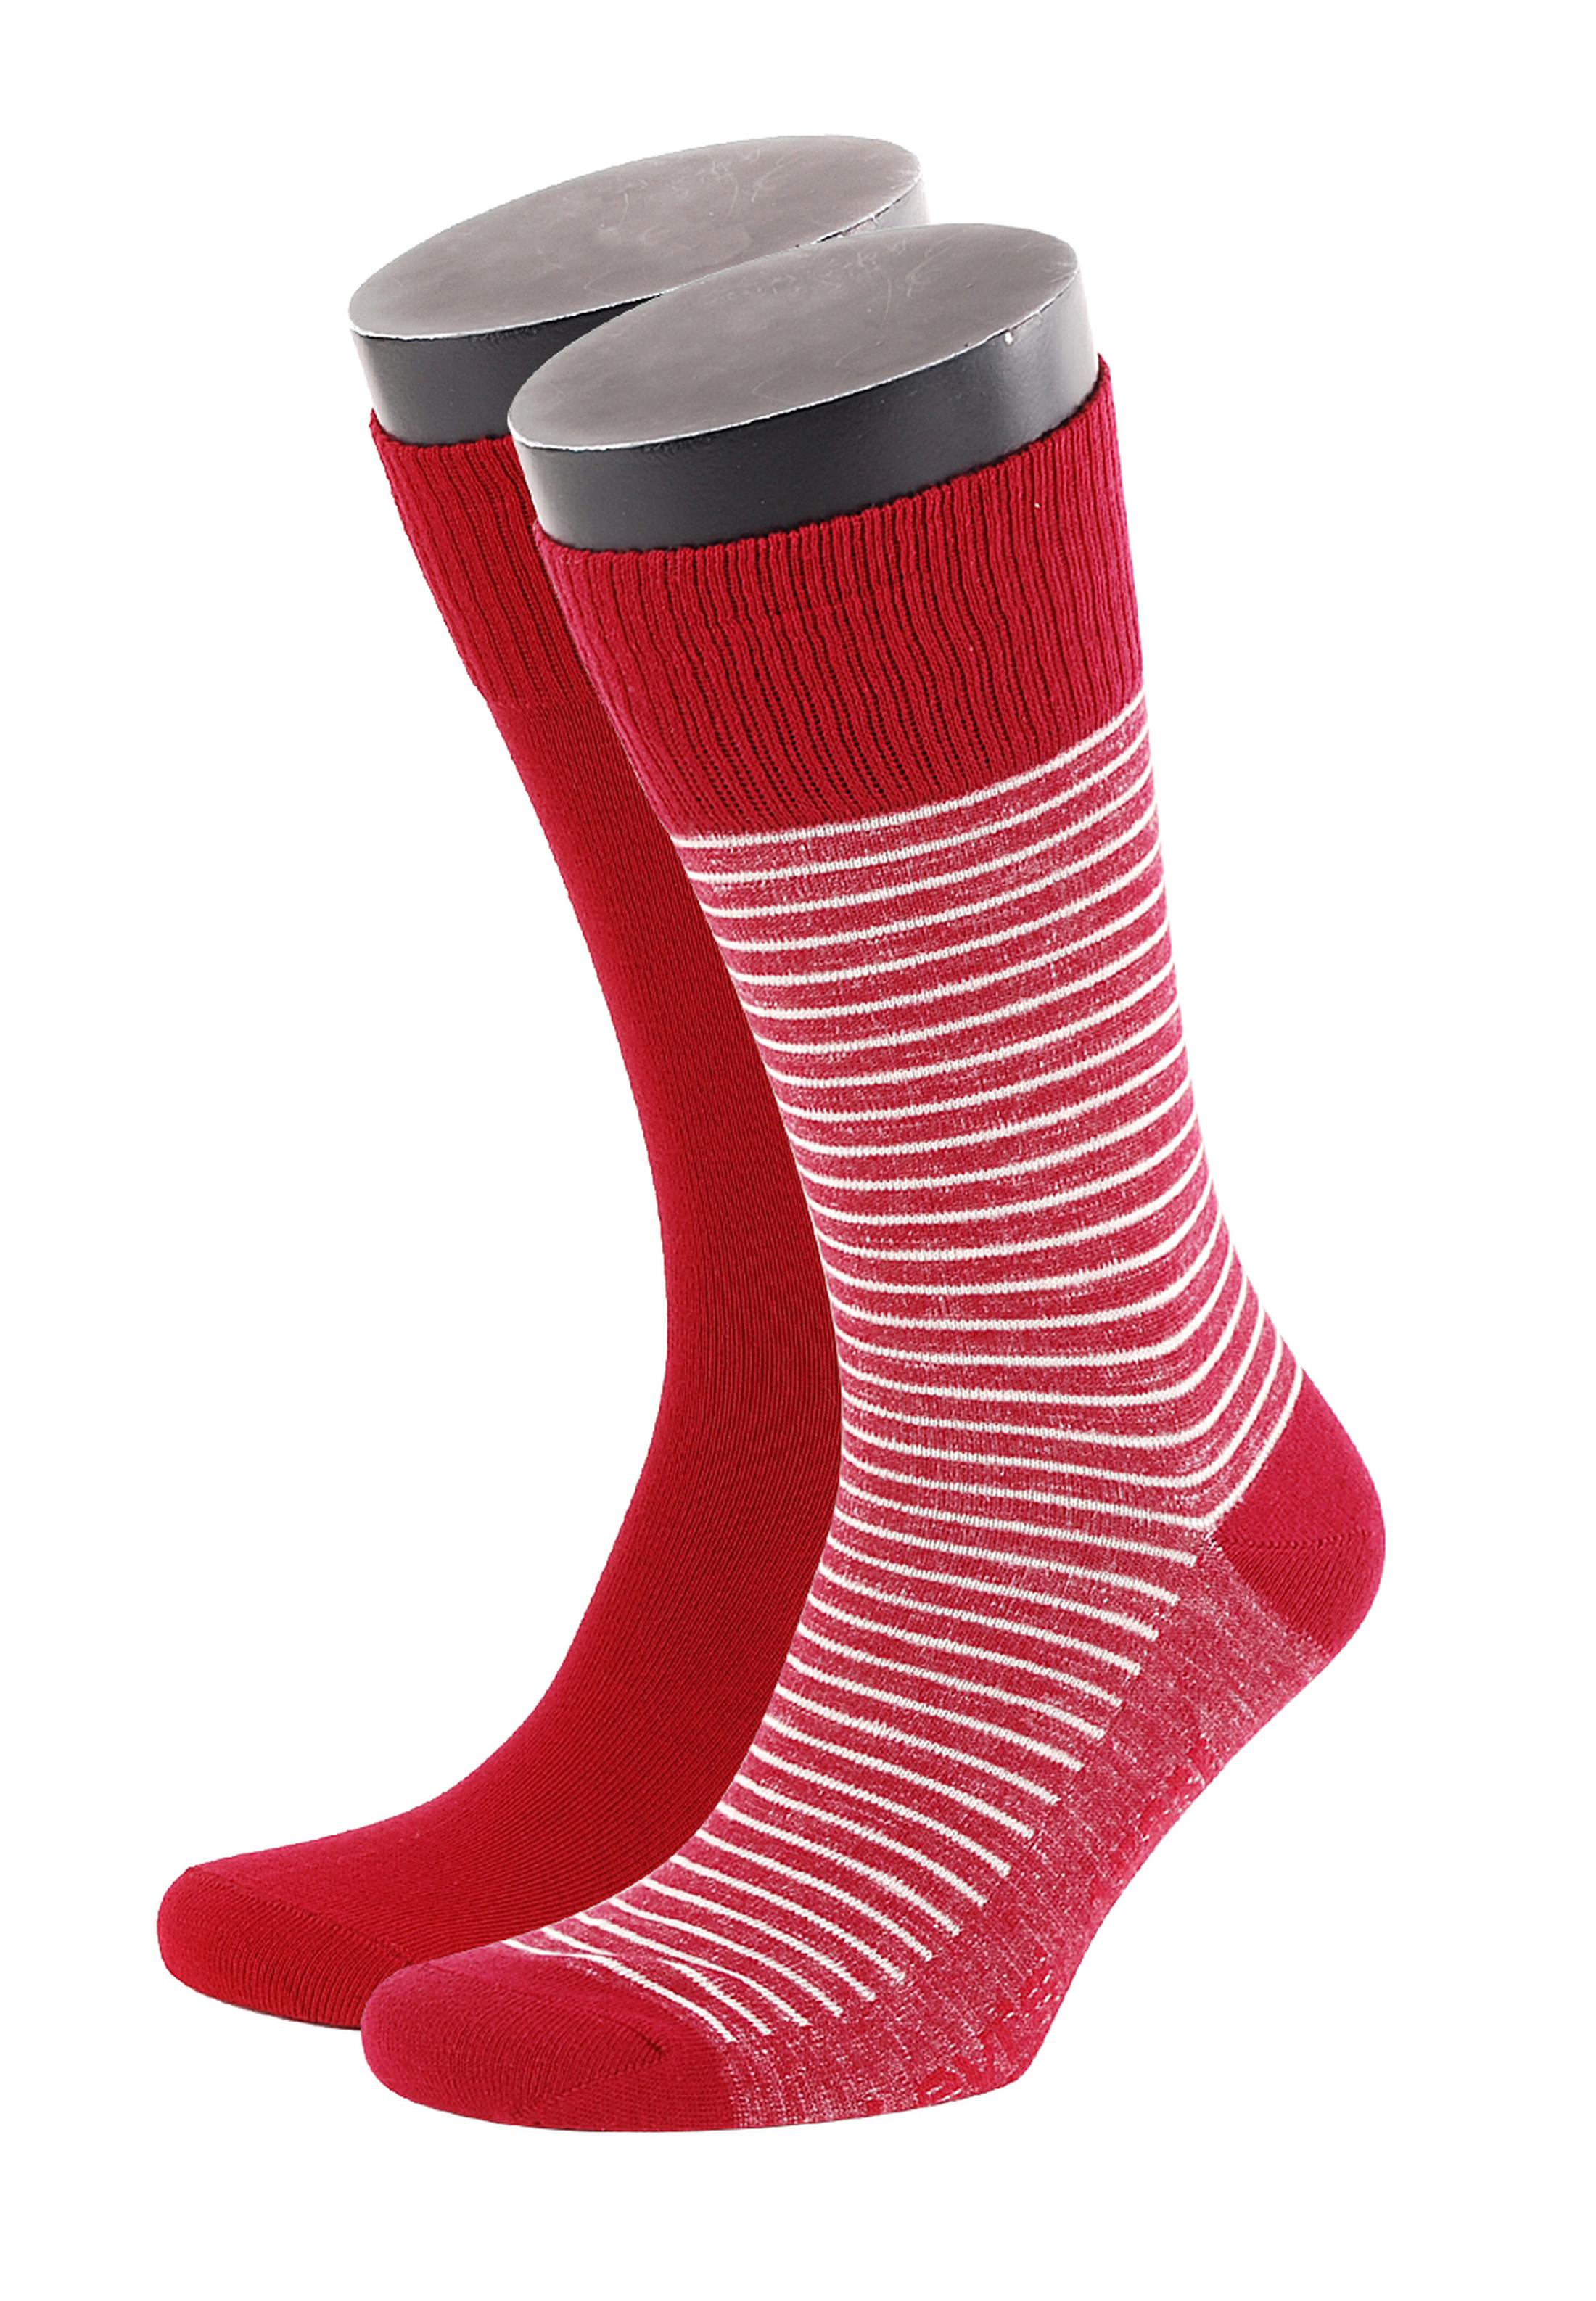 Levi's Socks Cotton 2-Pack Red + Stripes foto 0